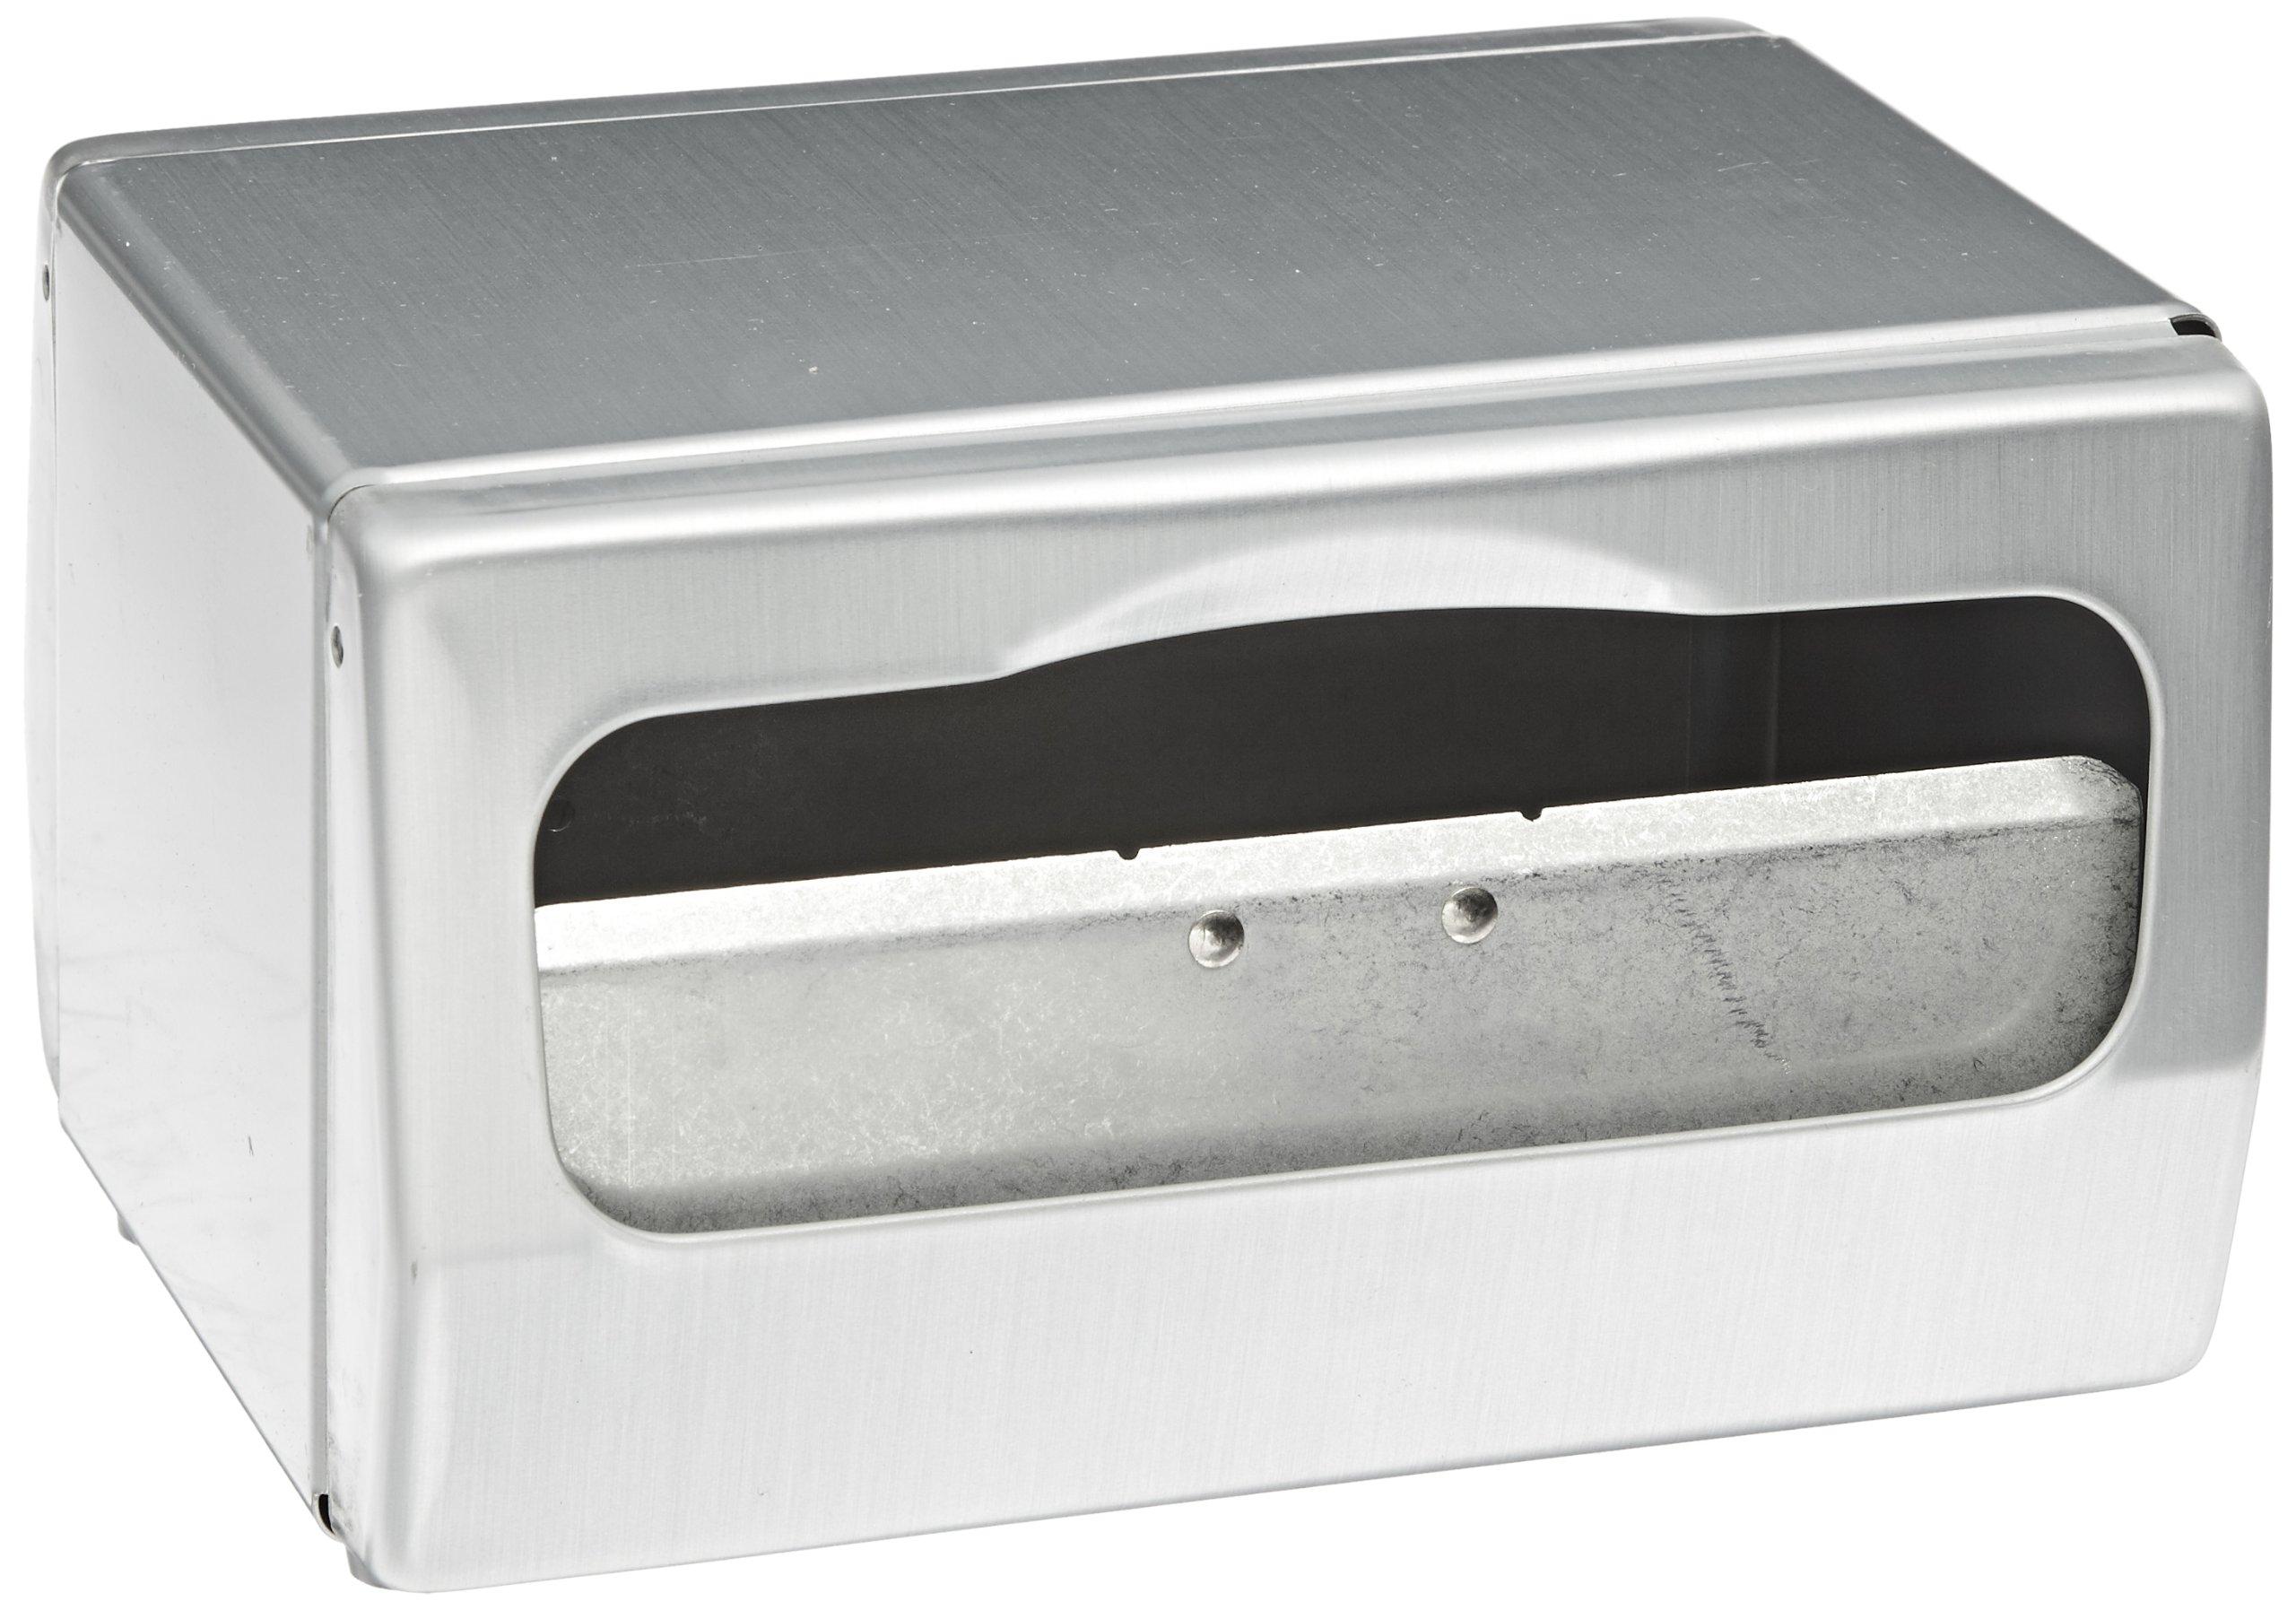 San Jamar H4000 Steel Tabletop Minifold Napkin Dispenser, 170 Capacity, 7-3/4'' Width x 4-1/2'' Height x 6'' Depth, Chrome